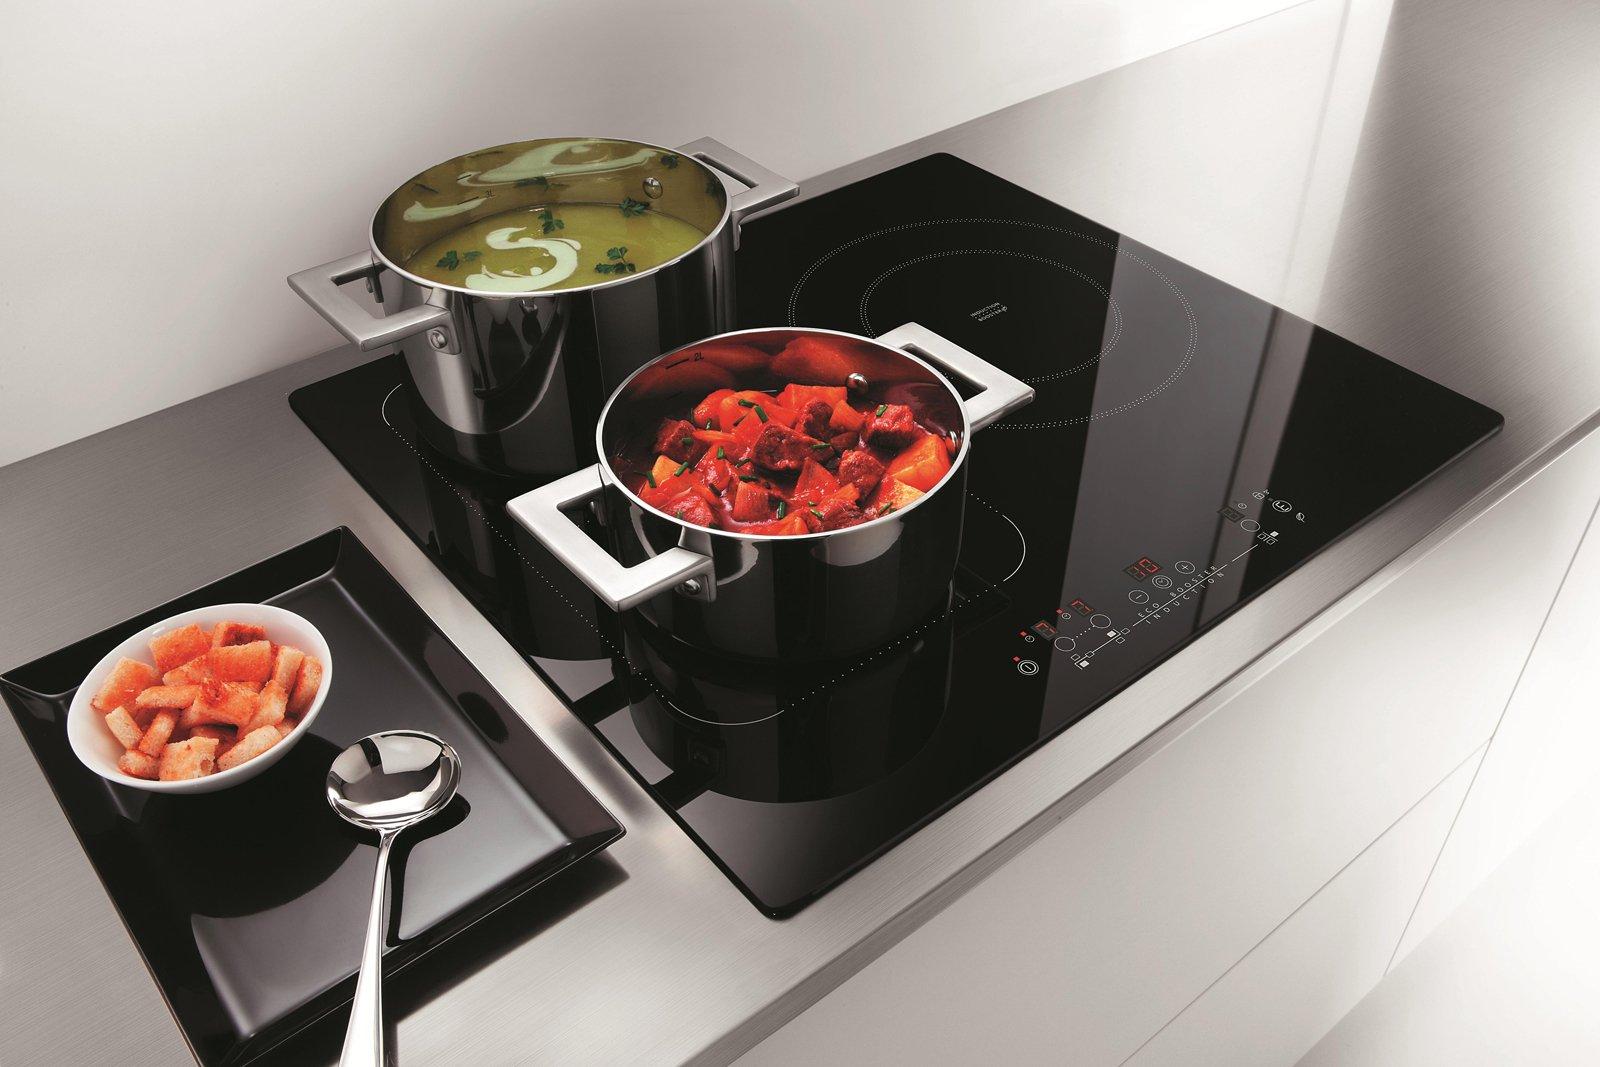 Piani cottura con o senza fiamma cose di casa - Pentole per cucine a induzione ...